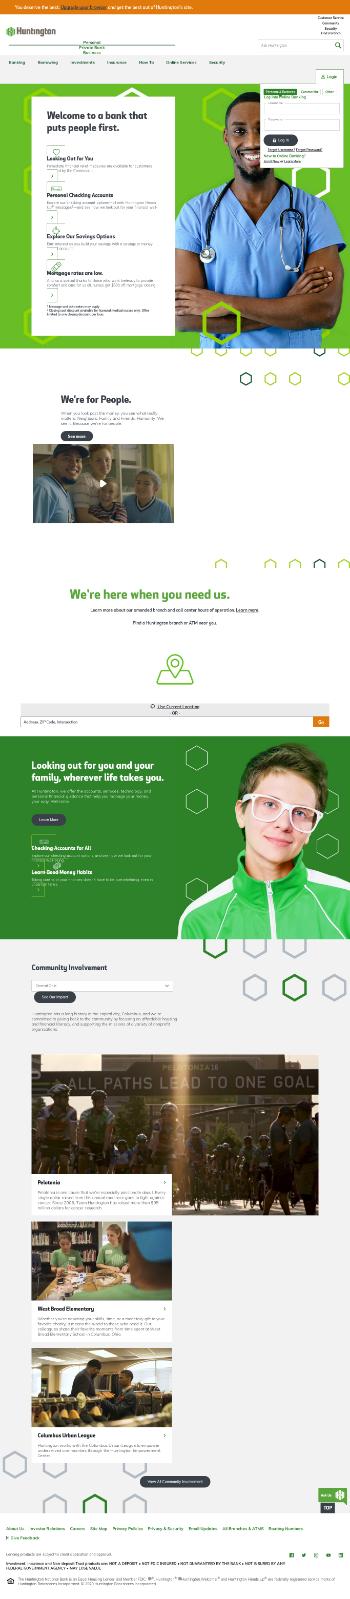 Huntington Bancshares Incorporated Website Screenshot